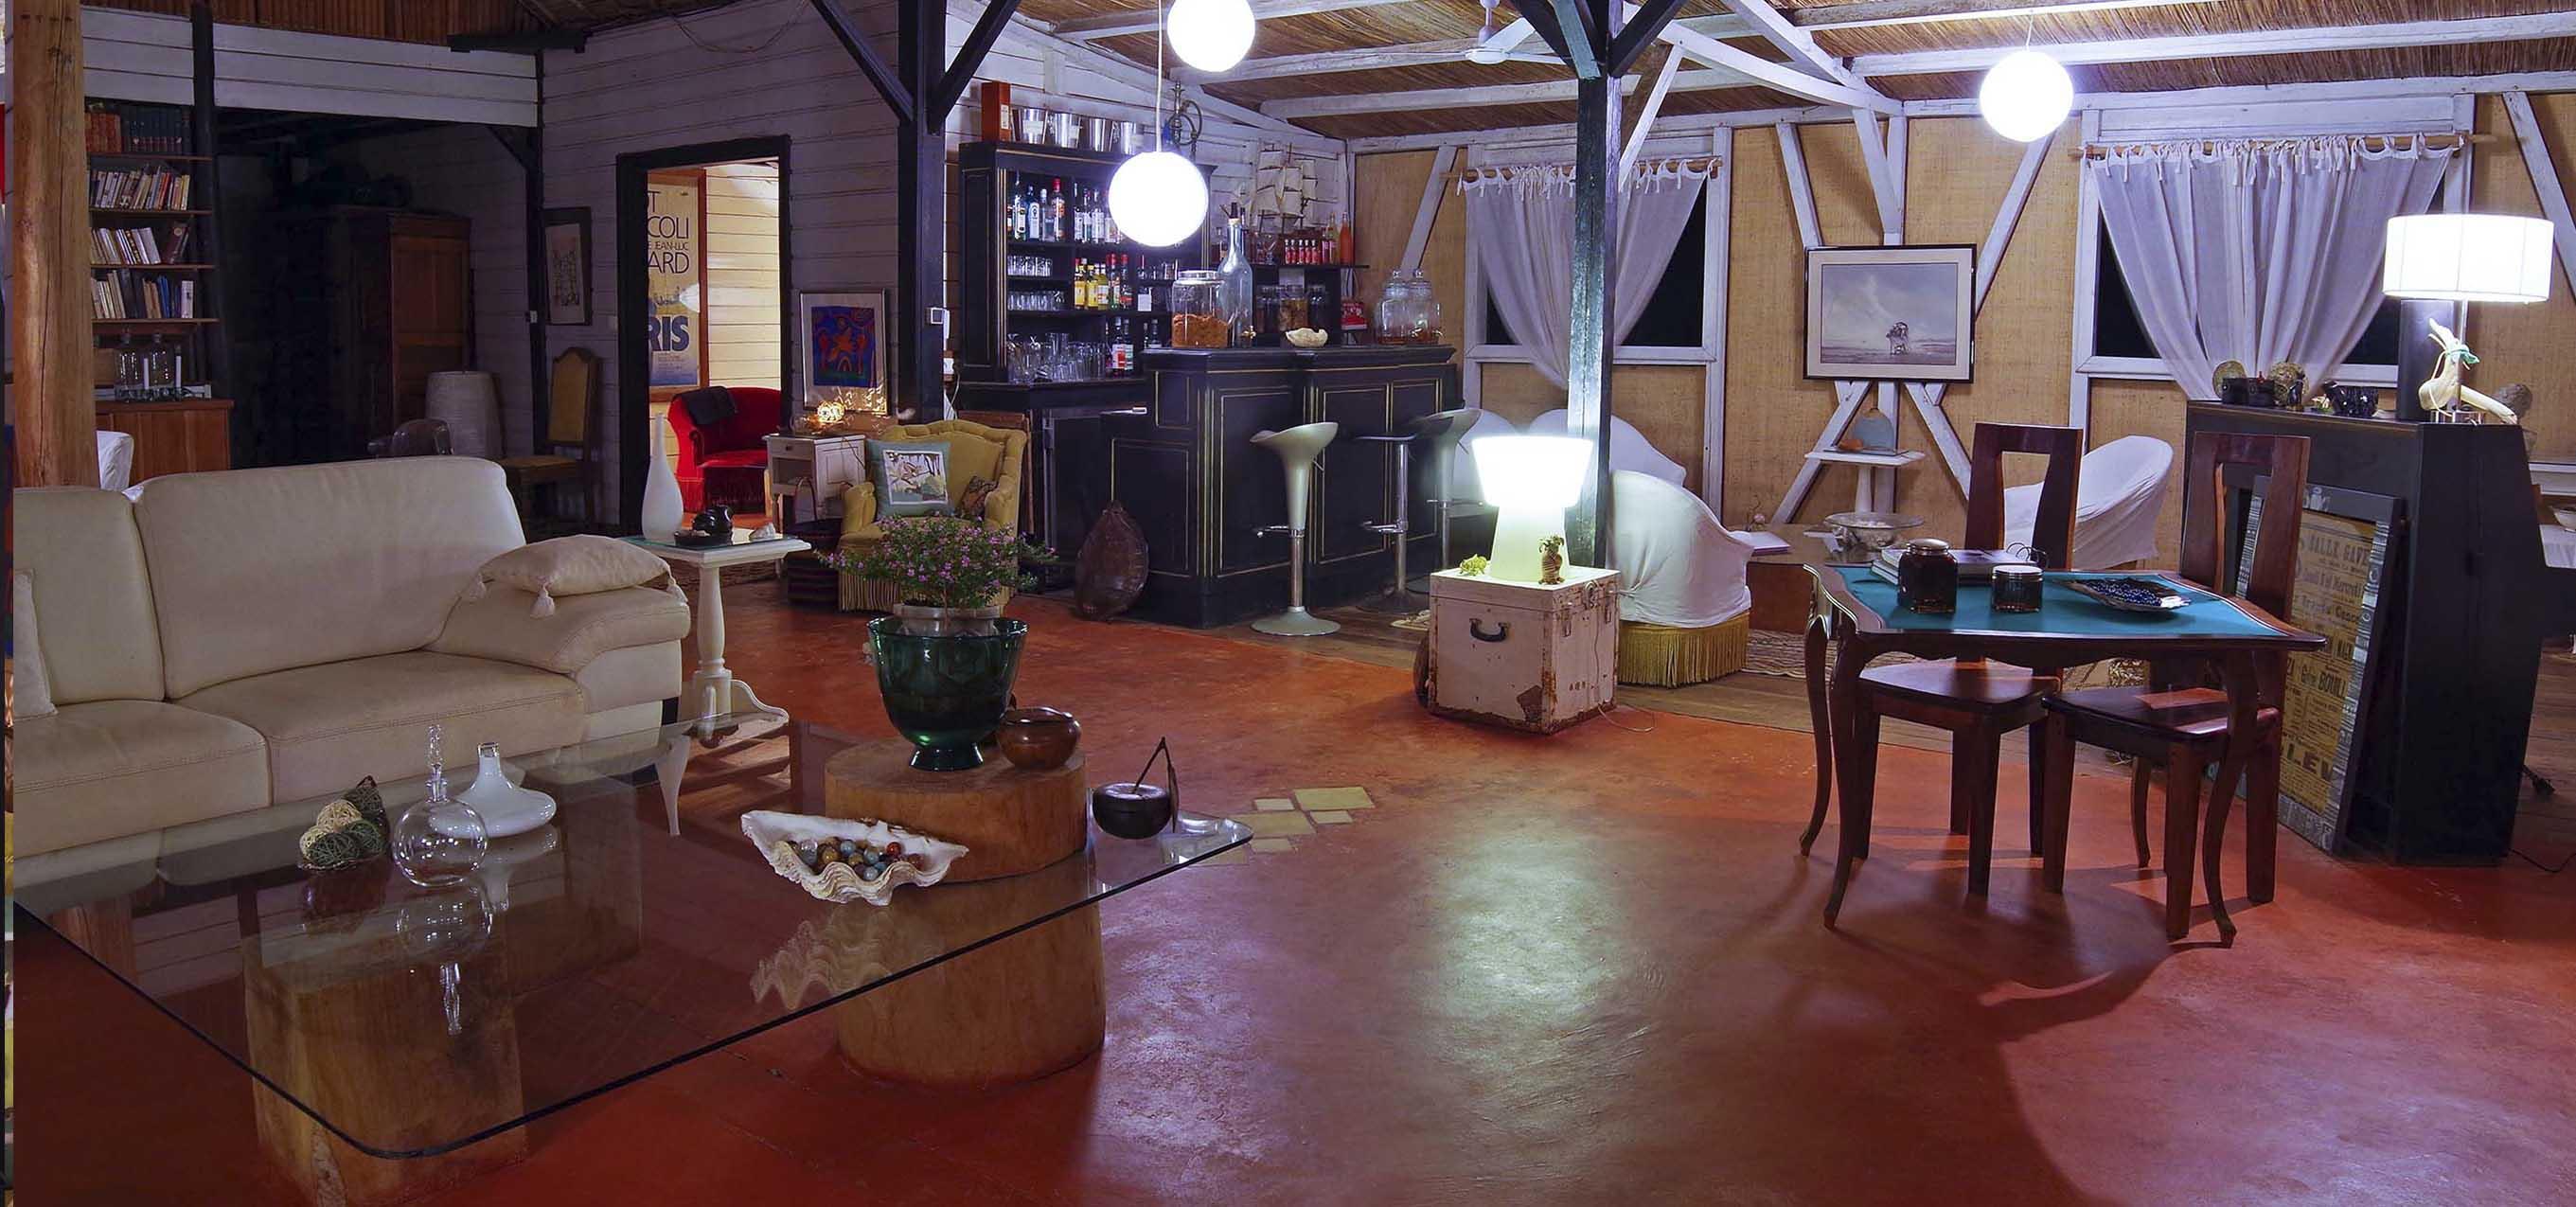 Salon-Interieur-3